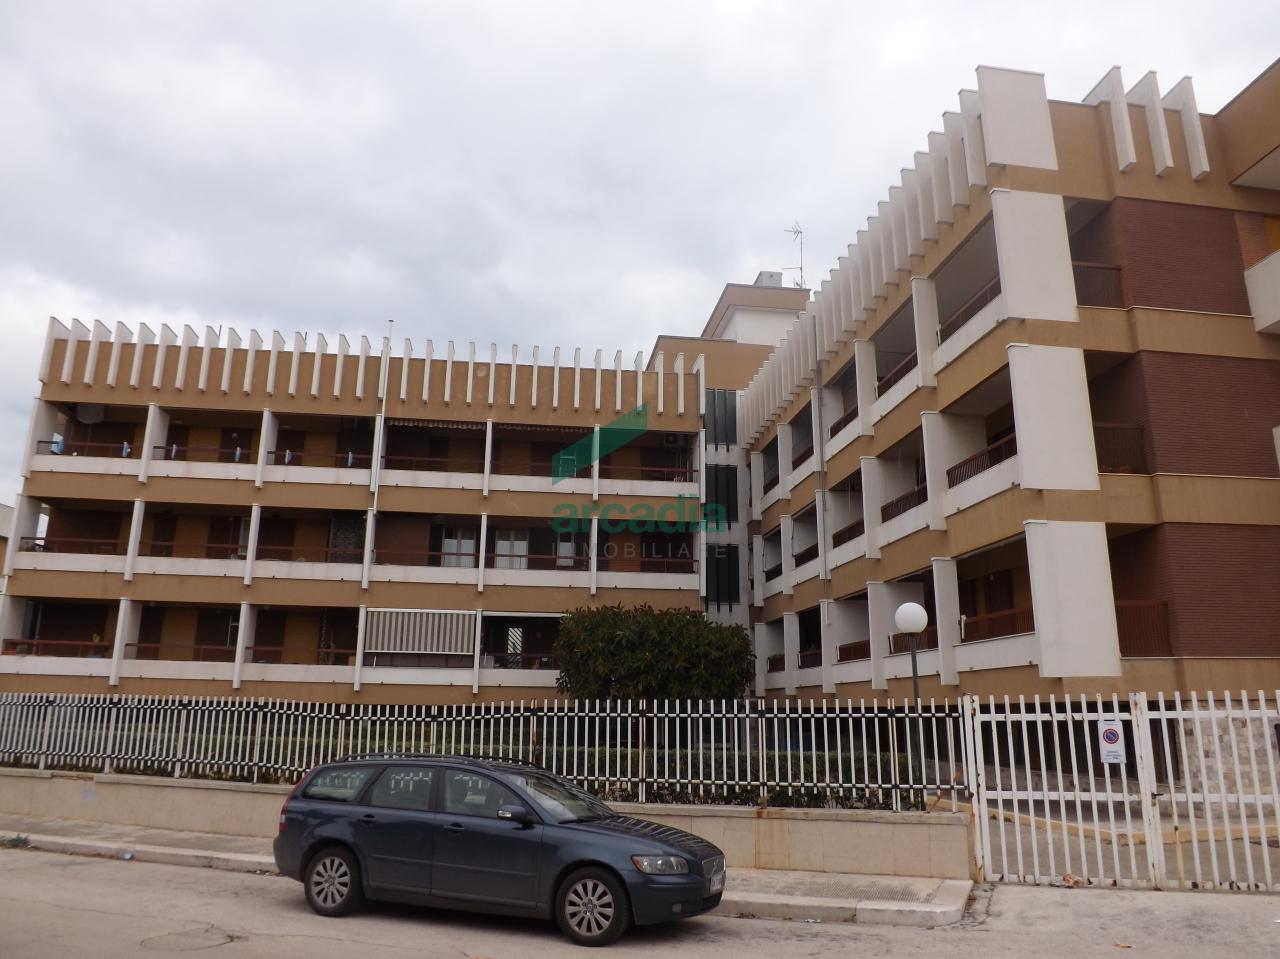 Bilocale Bari Via Luigi Marinelli Giovene 18 3